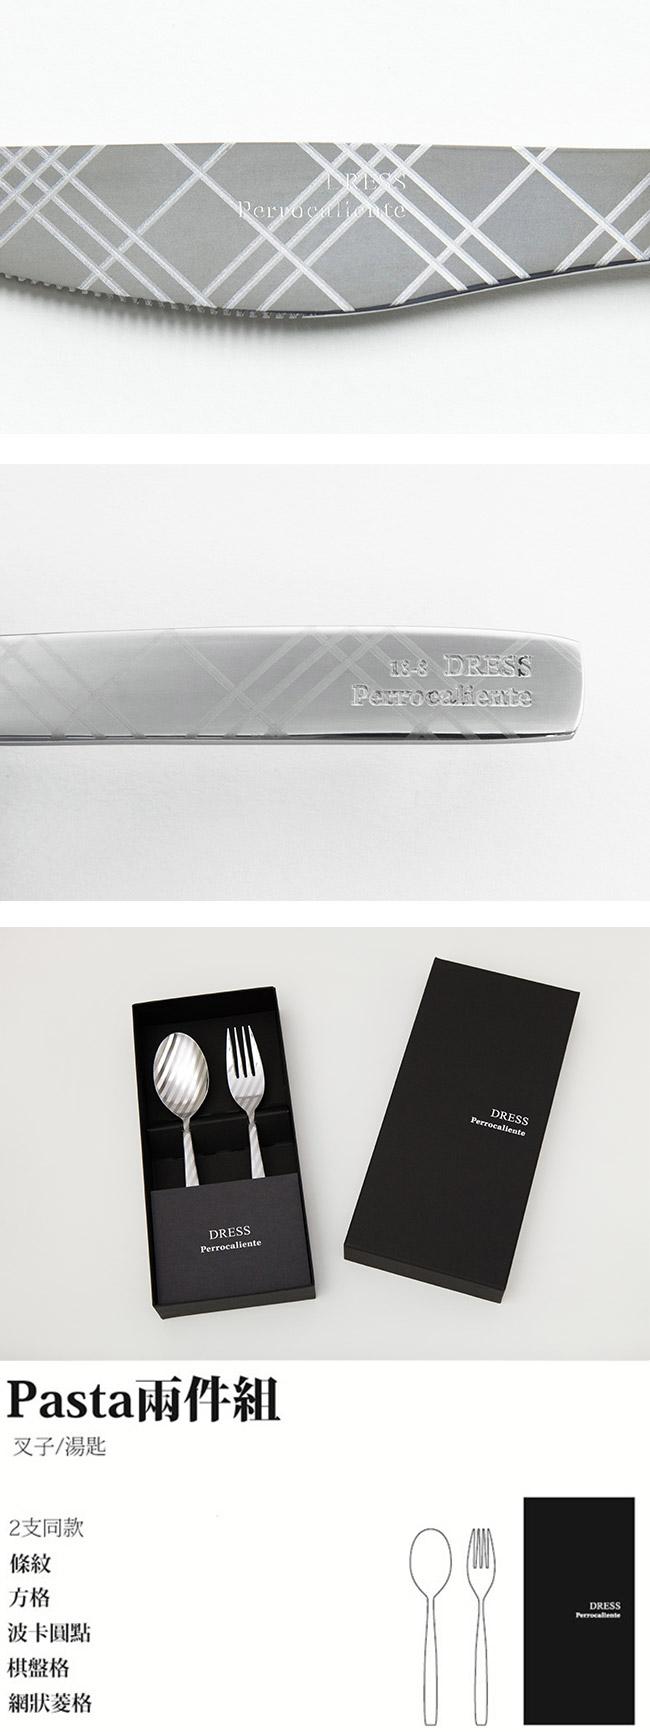 Perrocaliente Dress Gift Set 銀色盒裝餐具組 Pasta兩件組 方格 (湯匙+叉子)